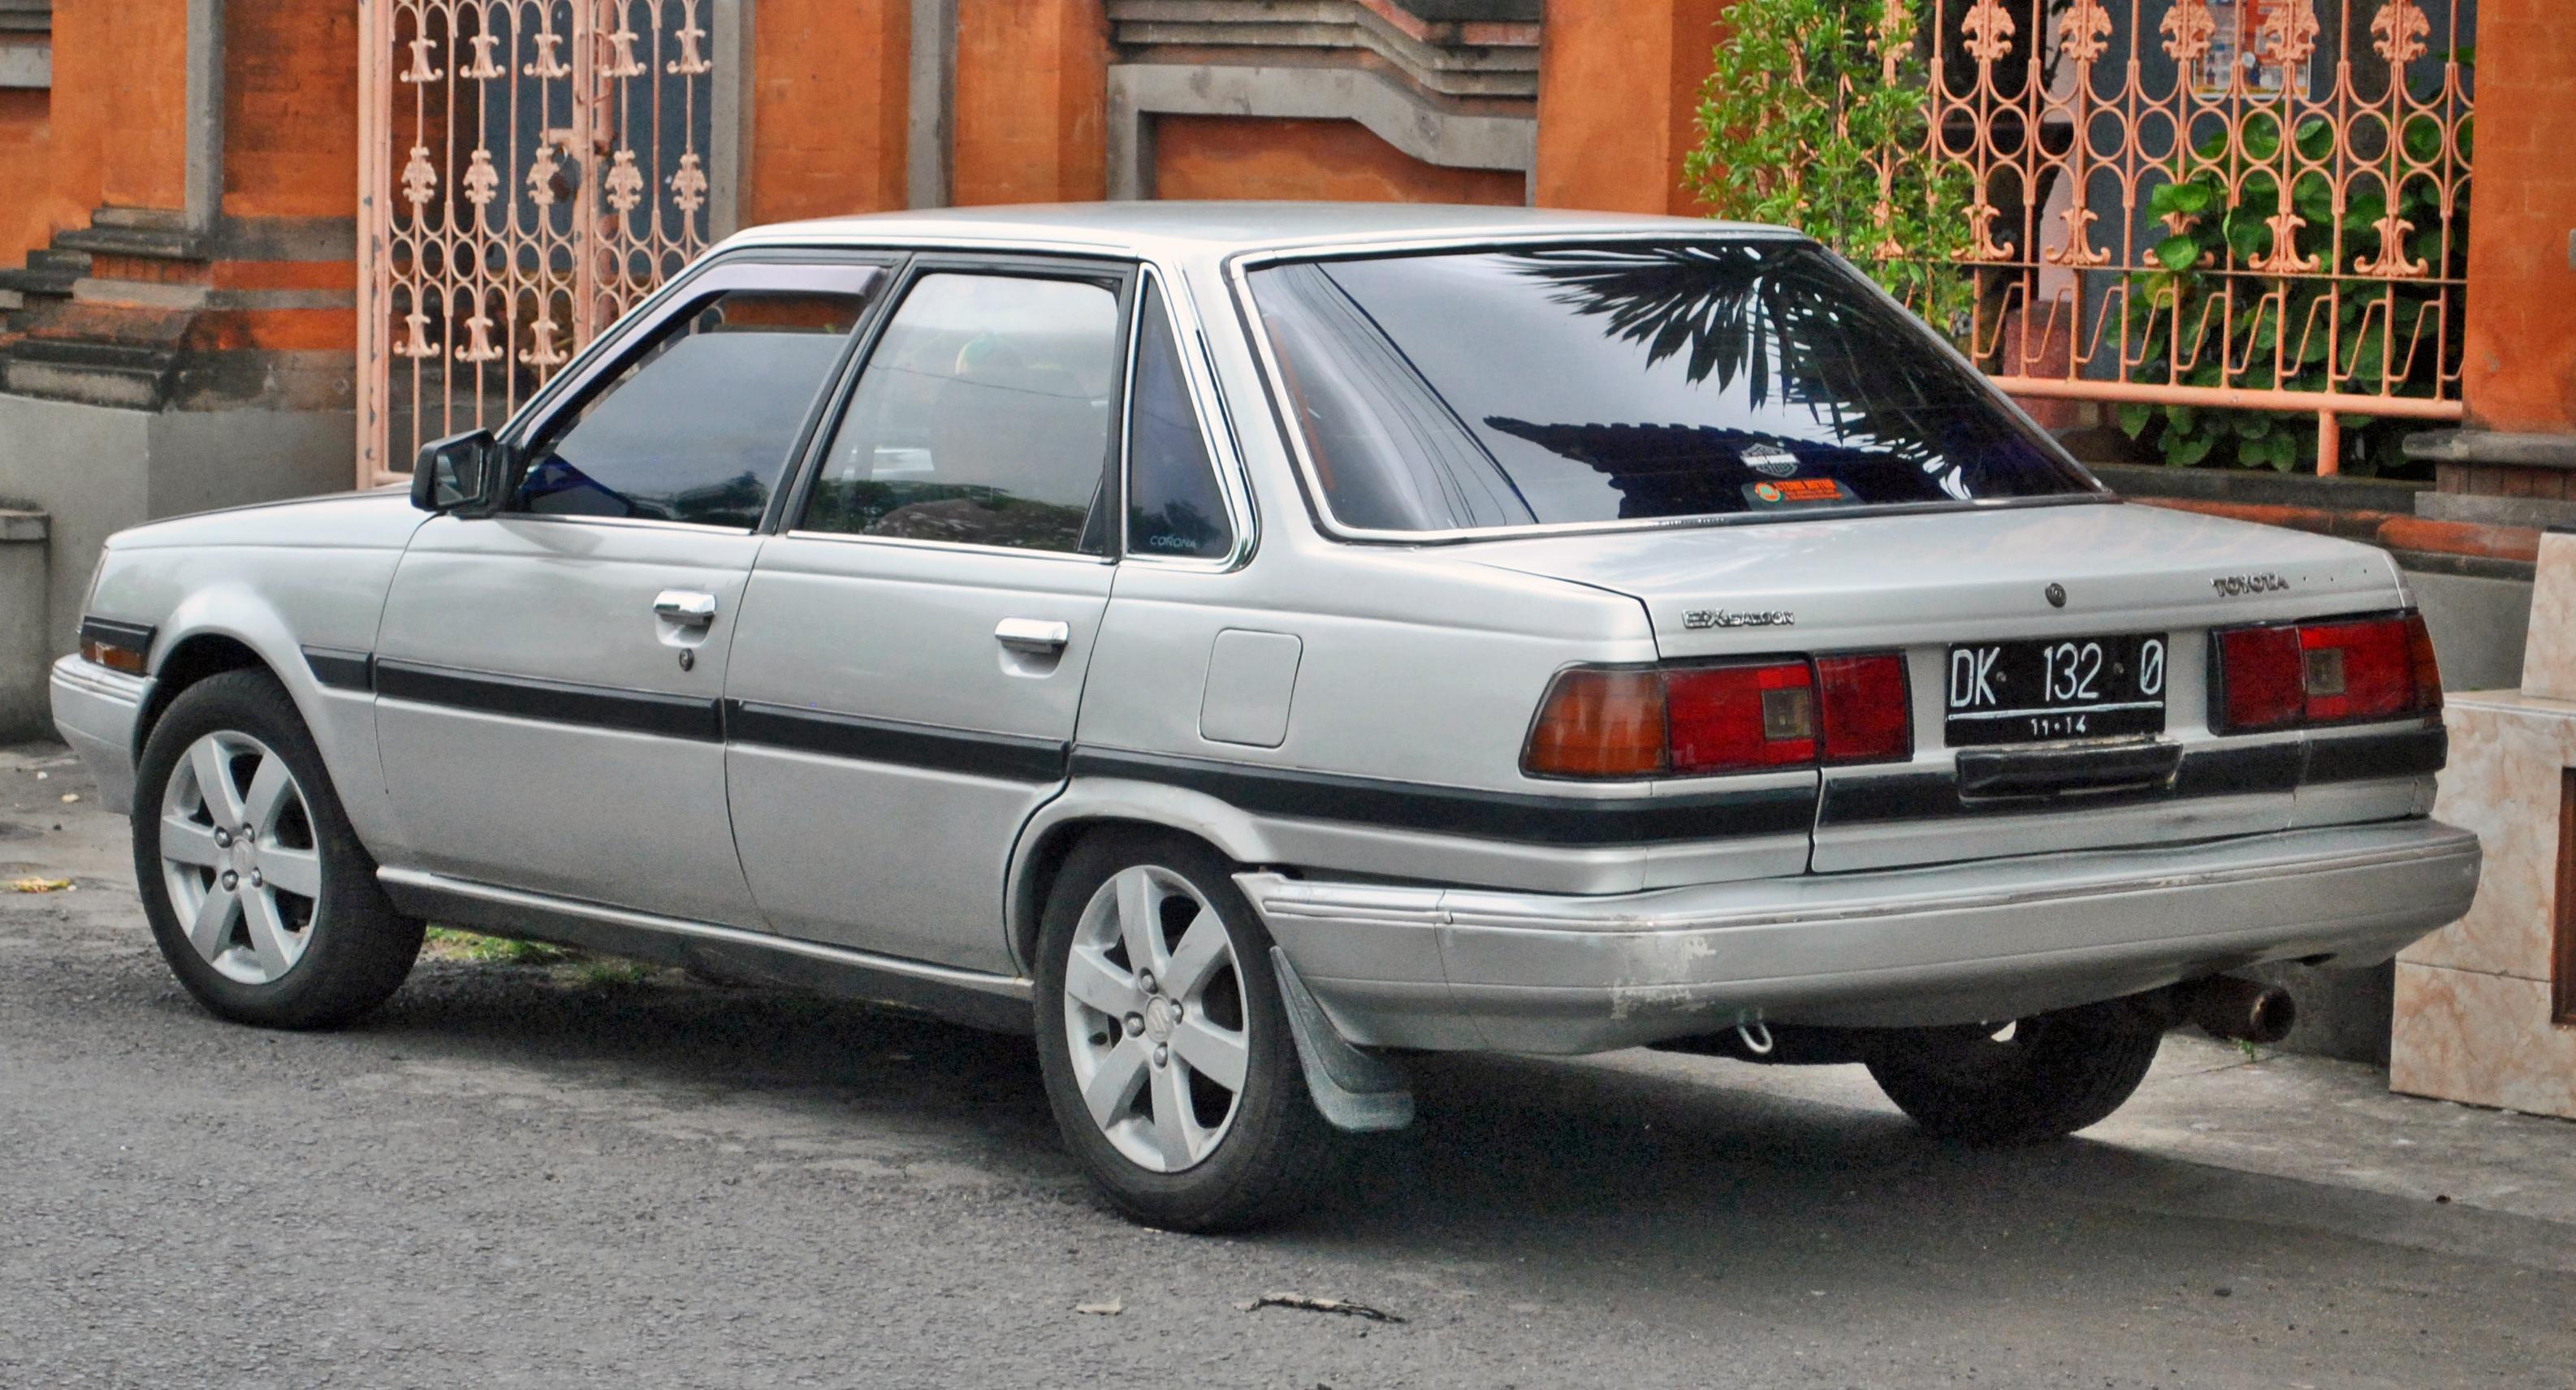 Toyota Carina III (A60) 1981 - 1988 Sedan #4